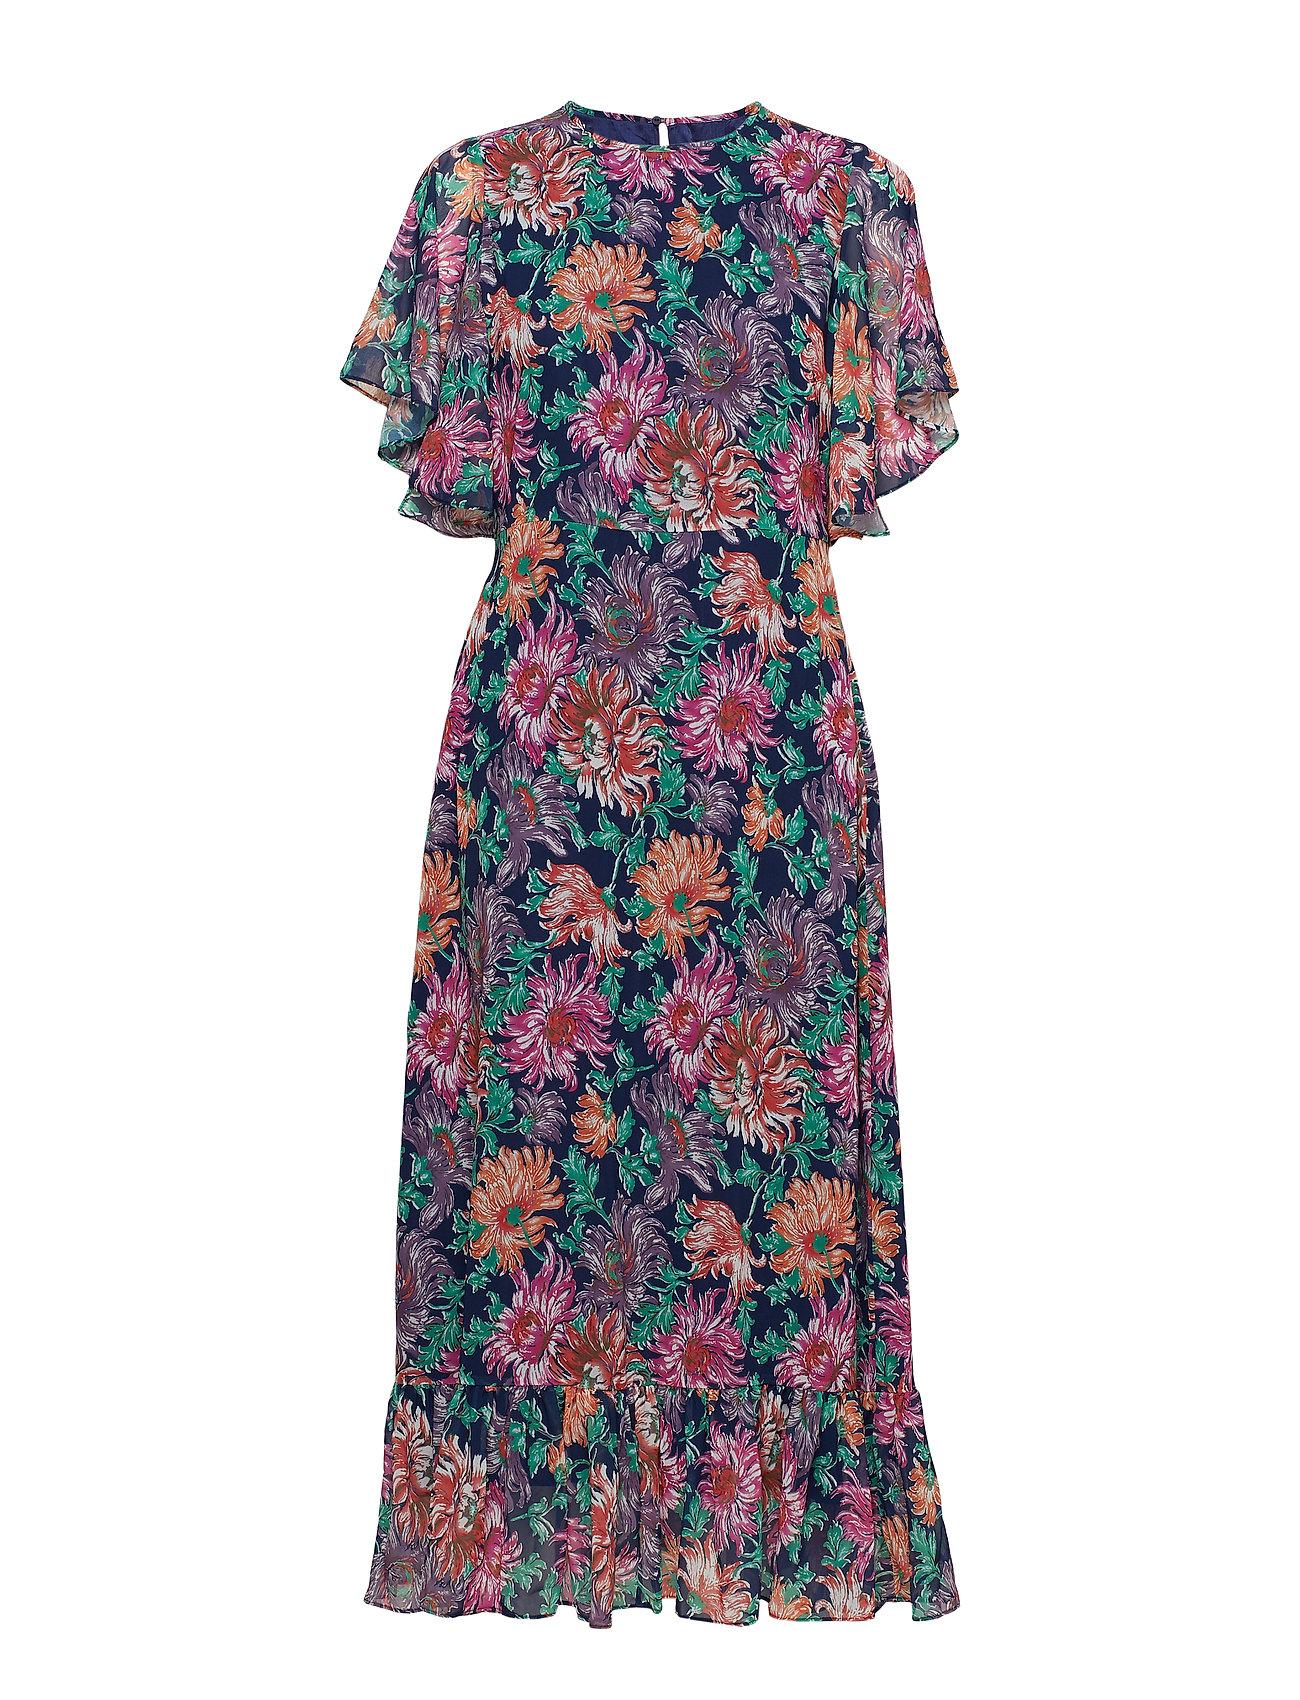 POSTYR POSANA DAY DRESS - PATRIOT BLUE